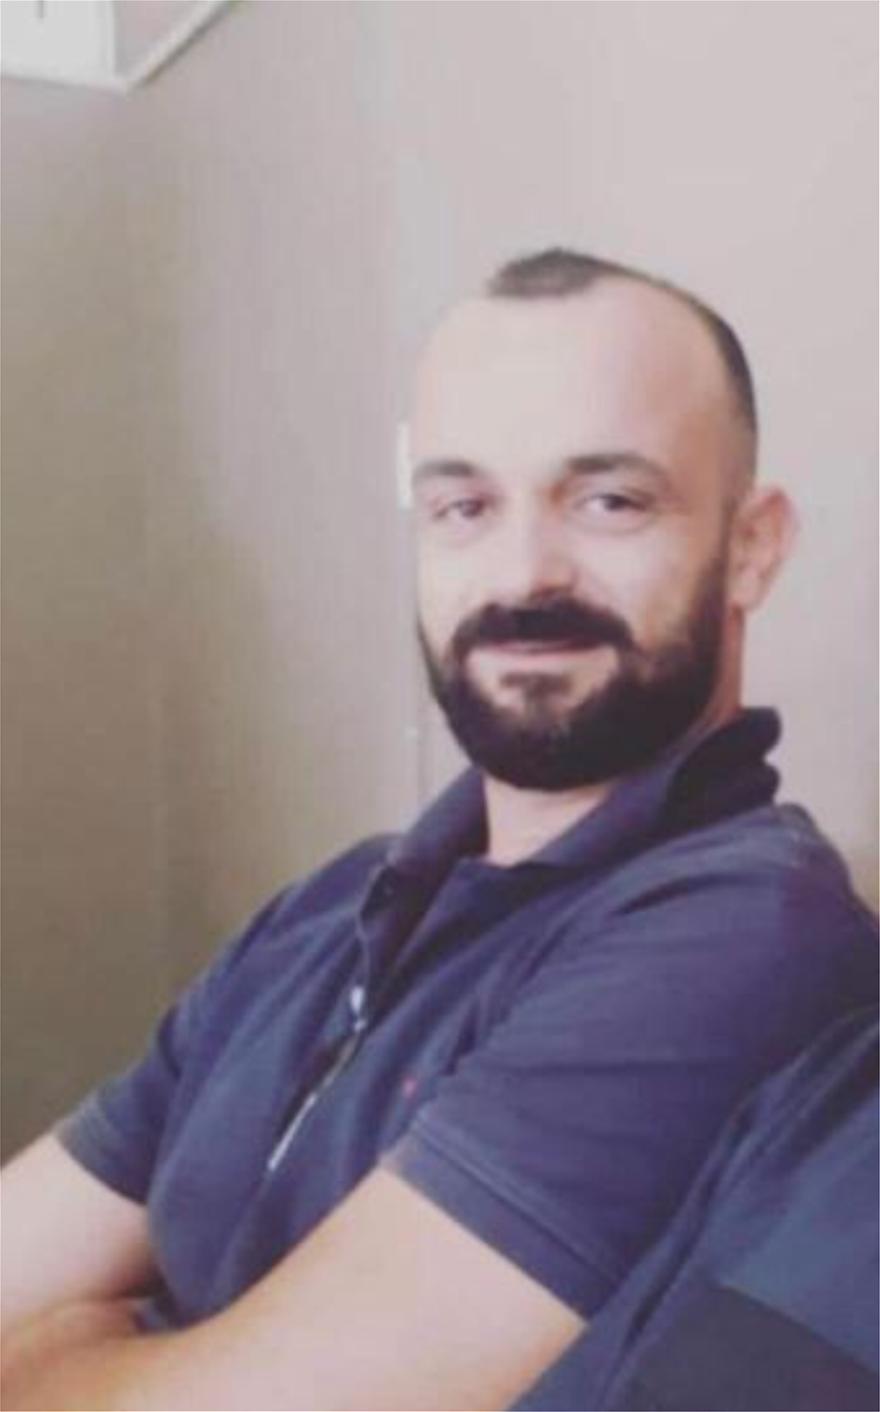 IMG_410244  Λαμία: Αυτός είναι ο πολύτεκνος 37χρονος, που έχασε τη ζωή του στο φρικτό τροχαίο IMG 410244